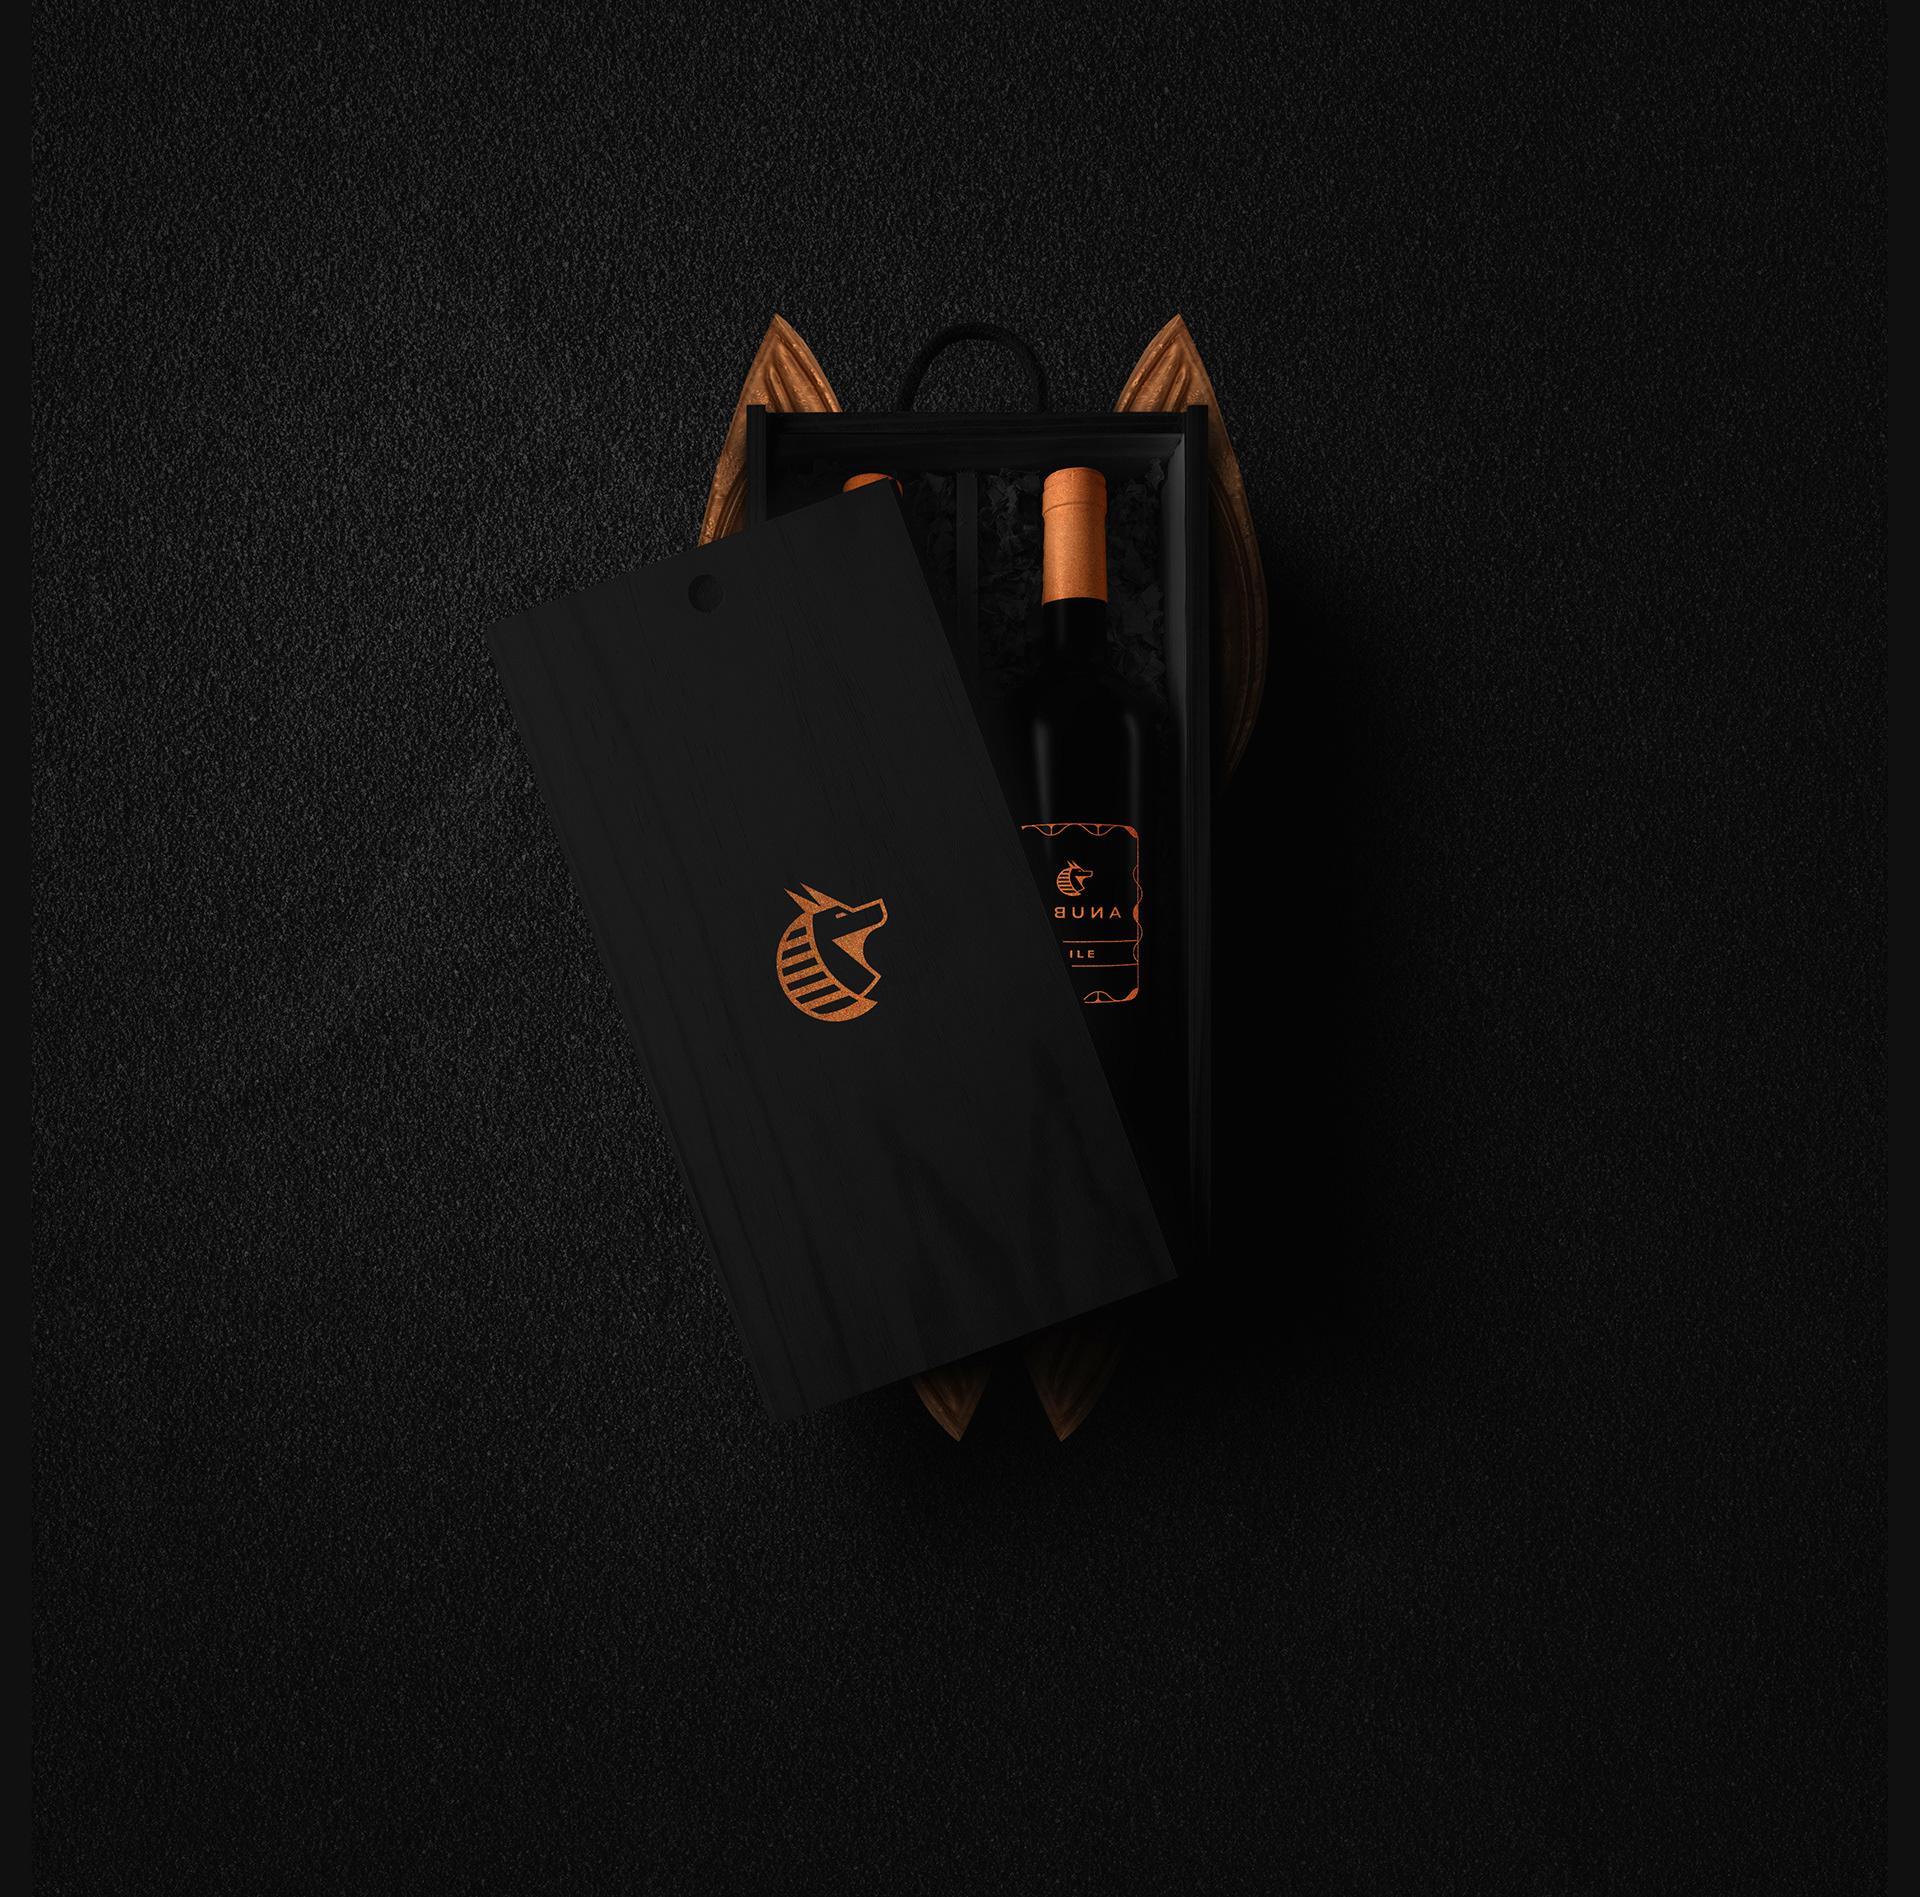 Luiz Arthuso Design Studio - Sibuna - Winery12.jpg